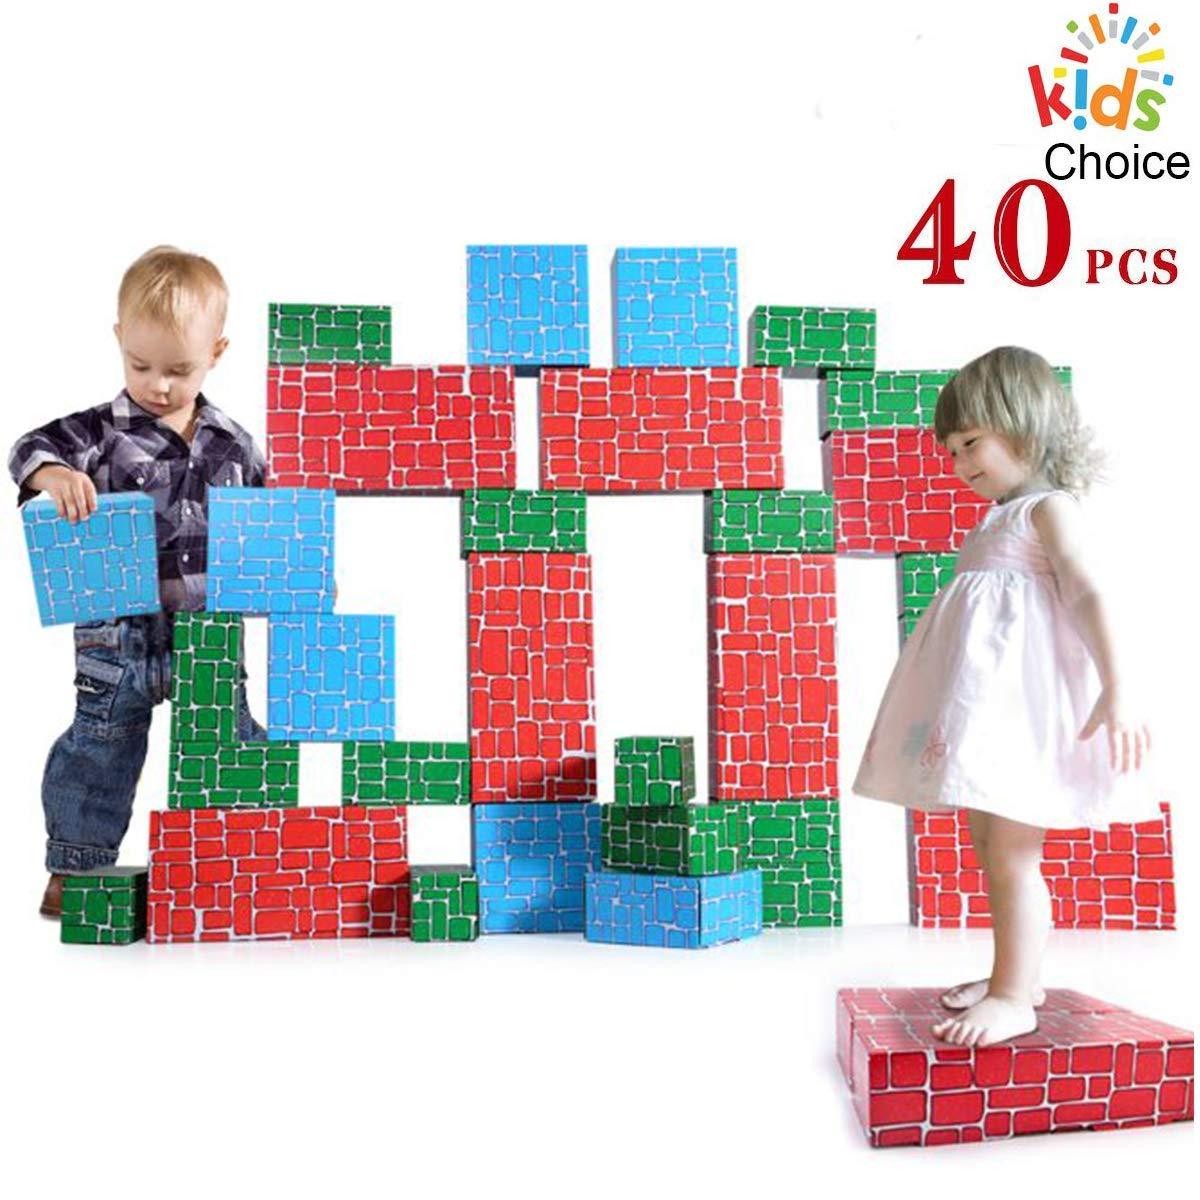 WishaLife 段ボールブロック 40ピース 組み立てブロック 極厚 ジャンボ 積み重ね可能 レンガ 3サイズ 幼児 子供用   B07RJWM4YL